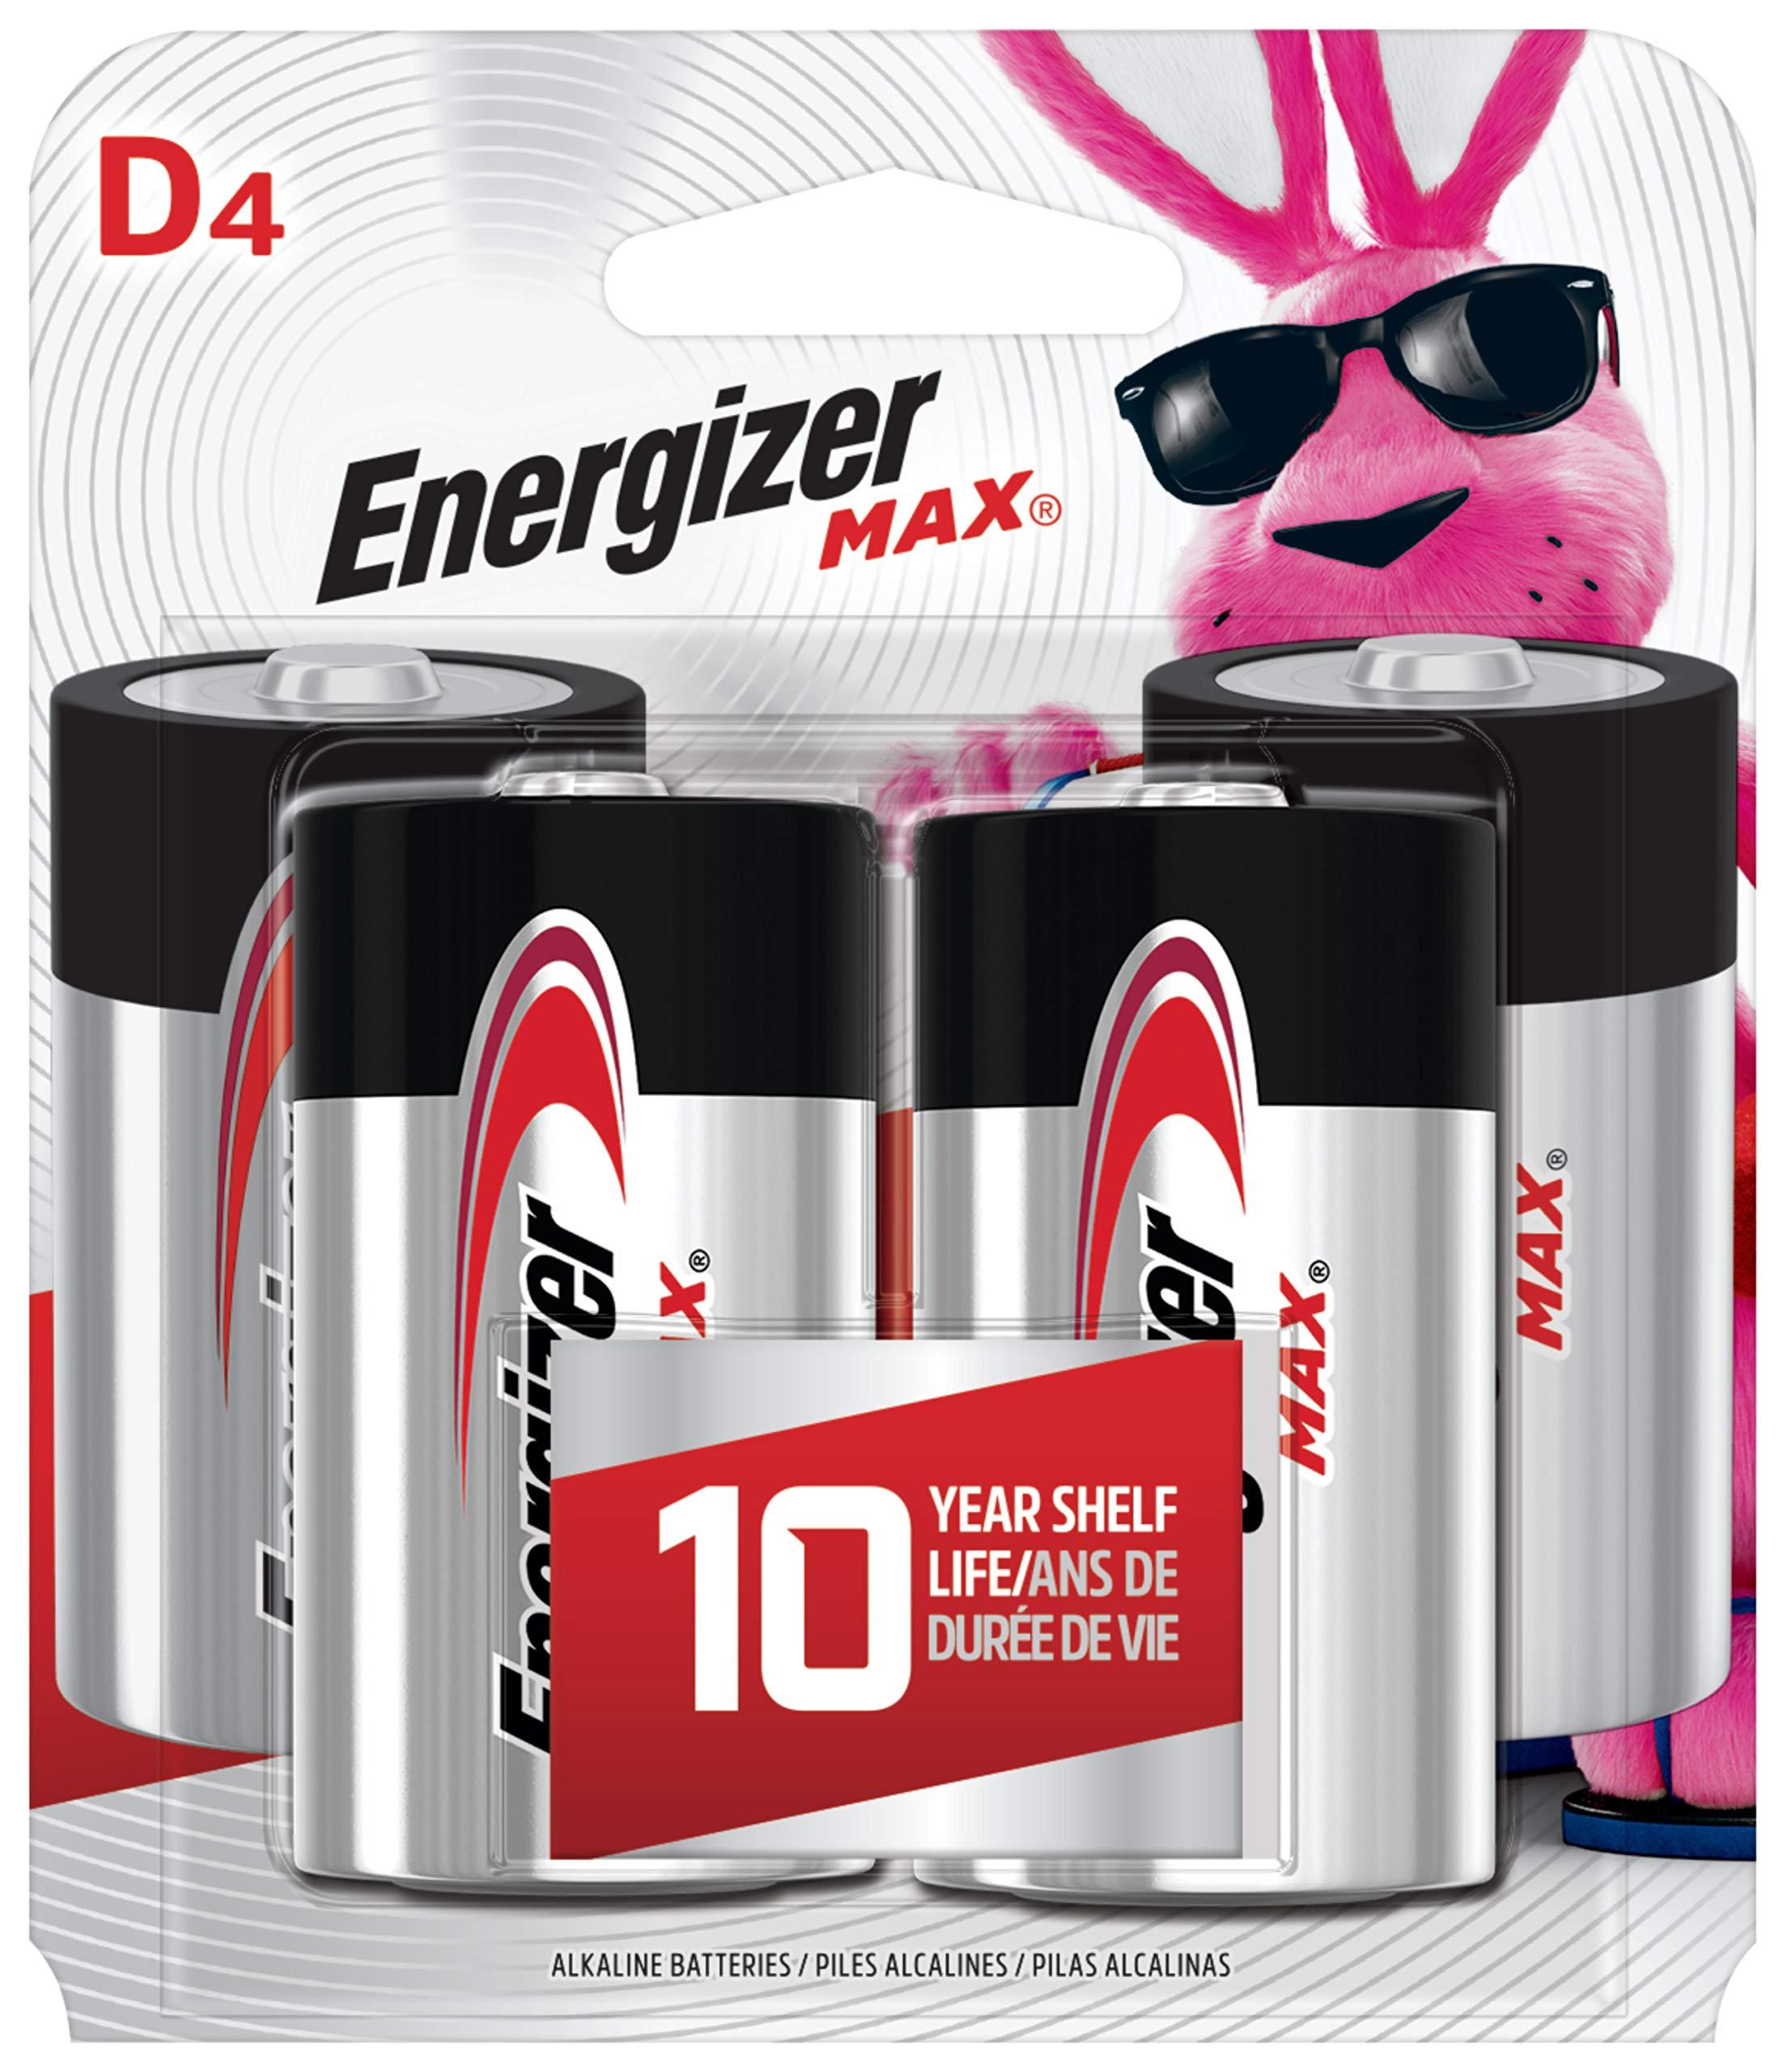 Energizer MAX Alkaline Batteries 4 Count